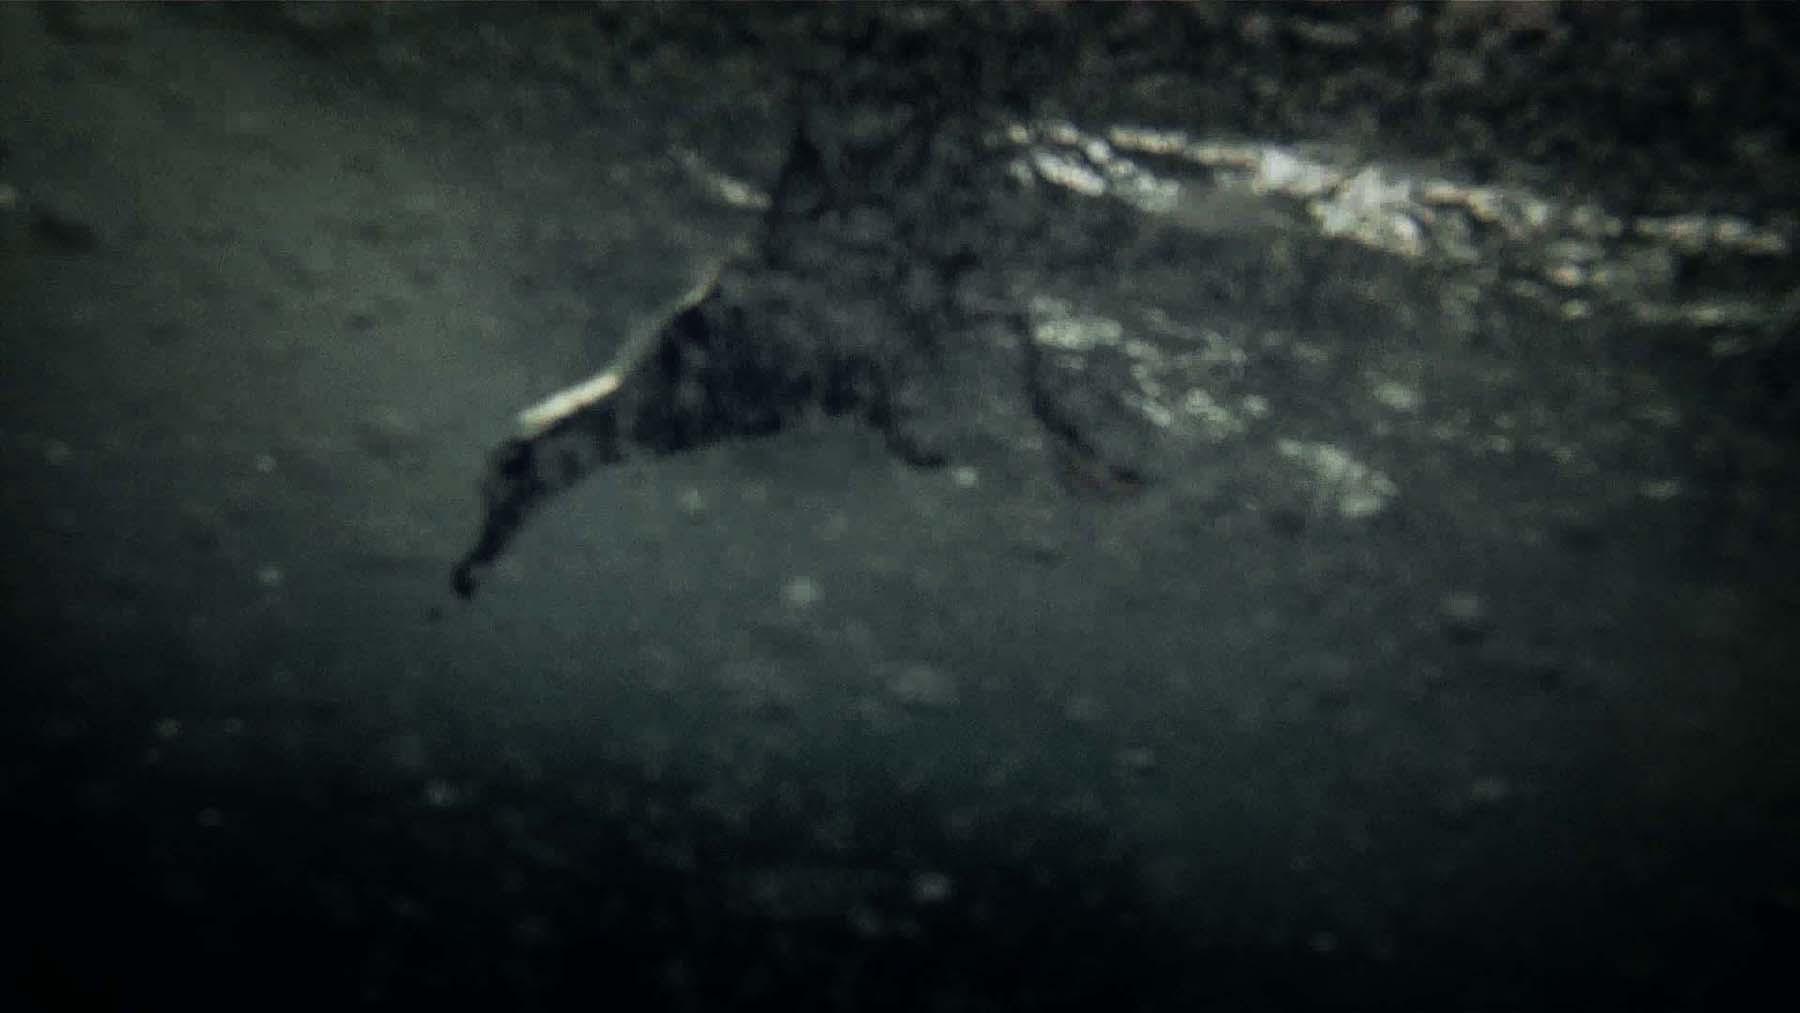 http://www.arretetoncinema.org/leviathan/stills/Oiseau_sous_marin.jpg